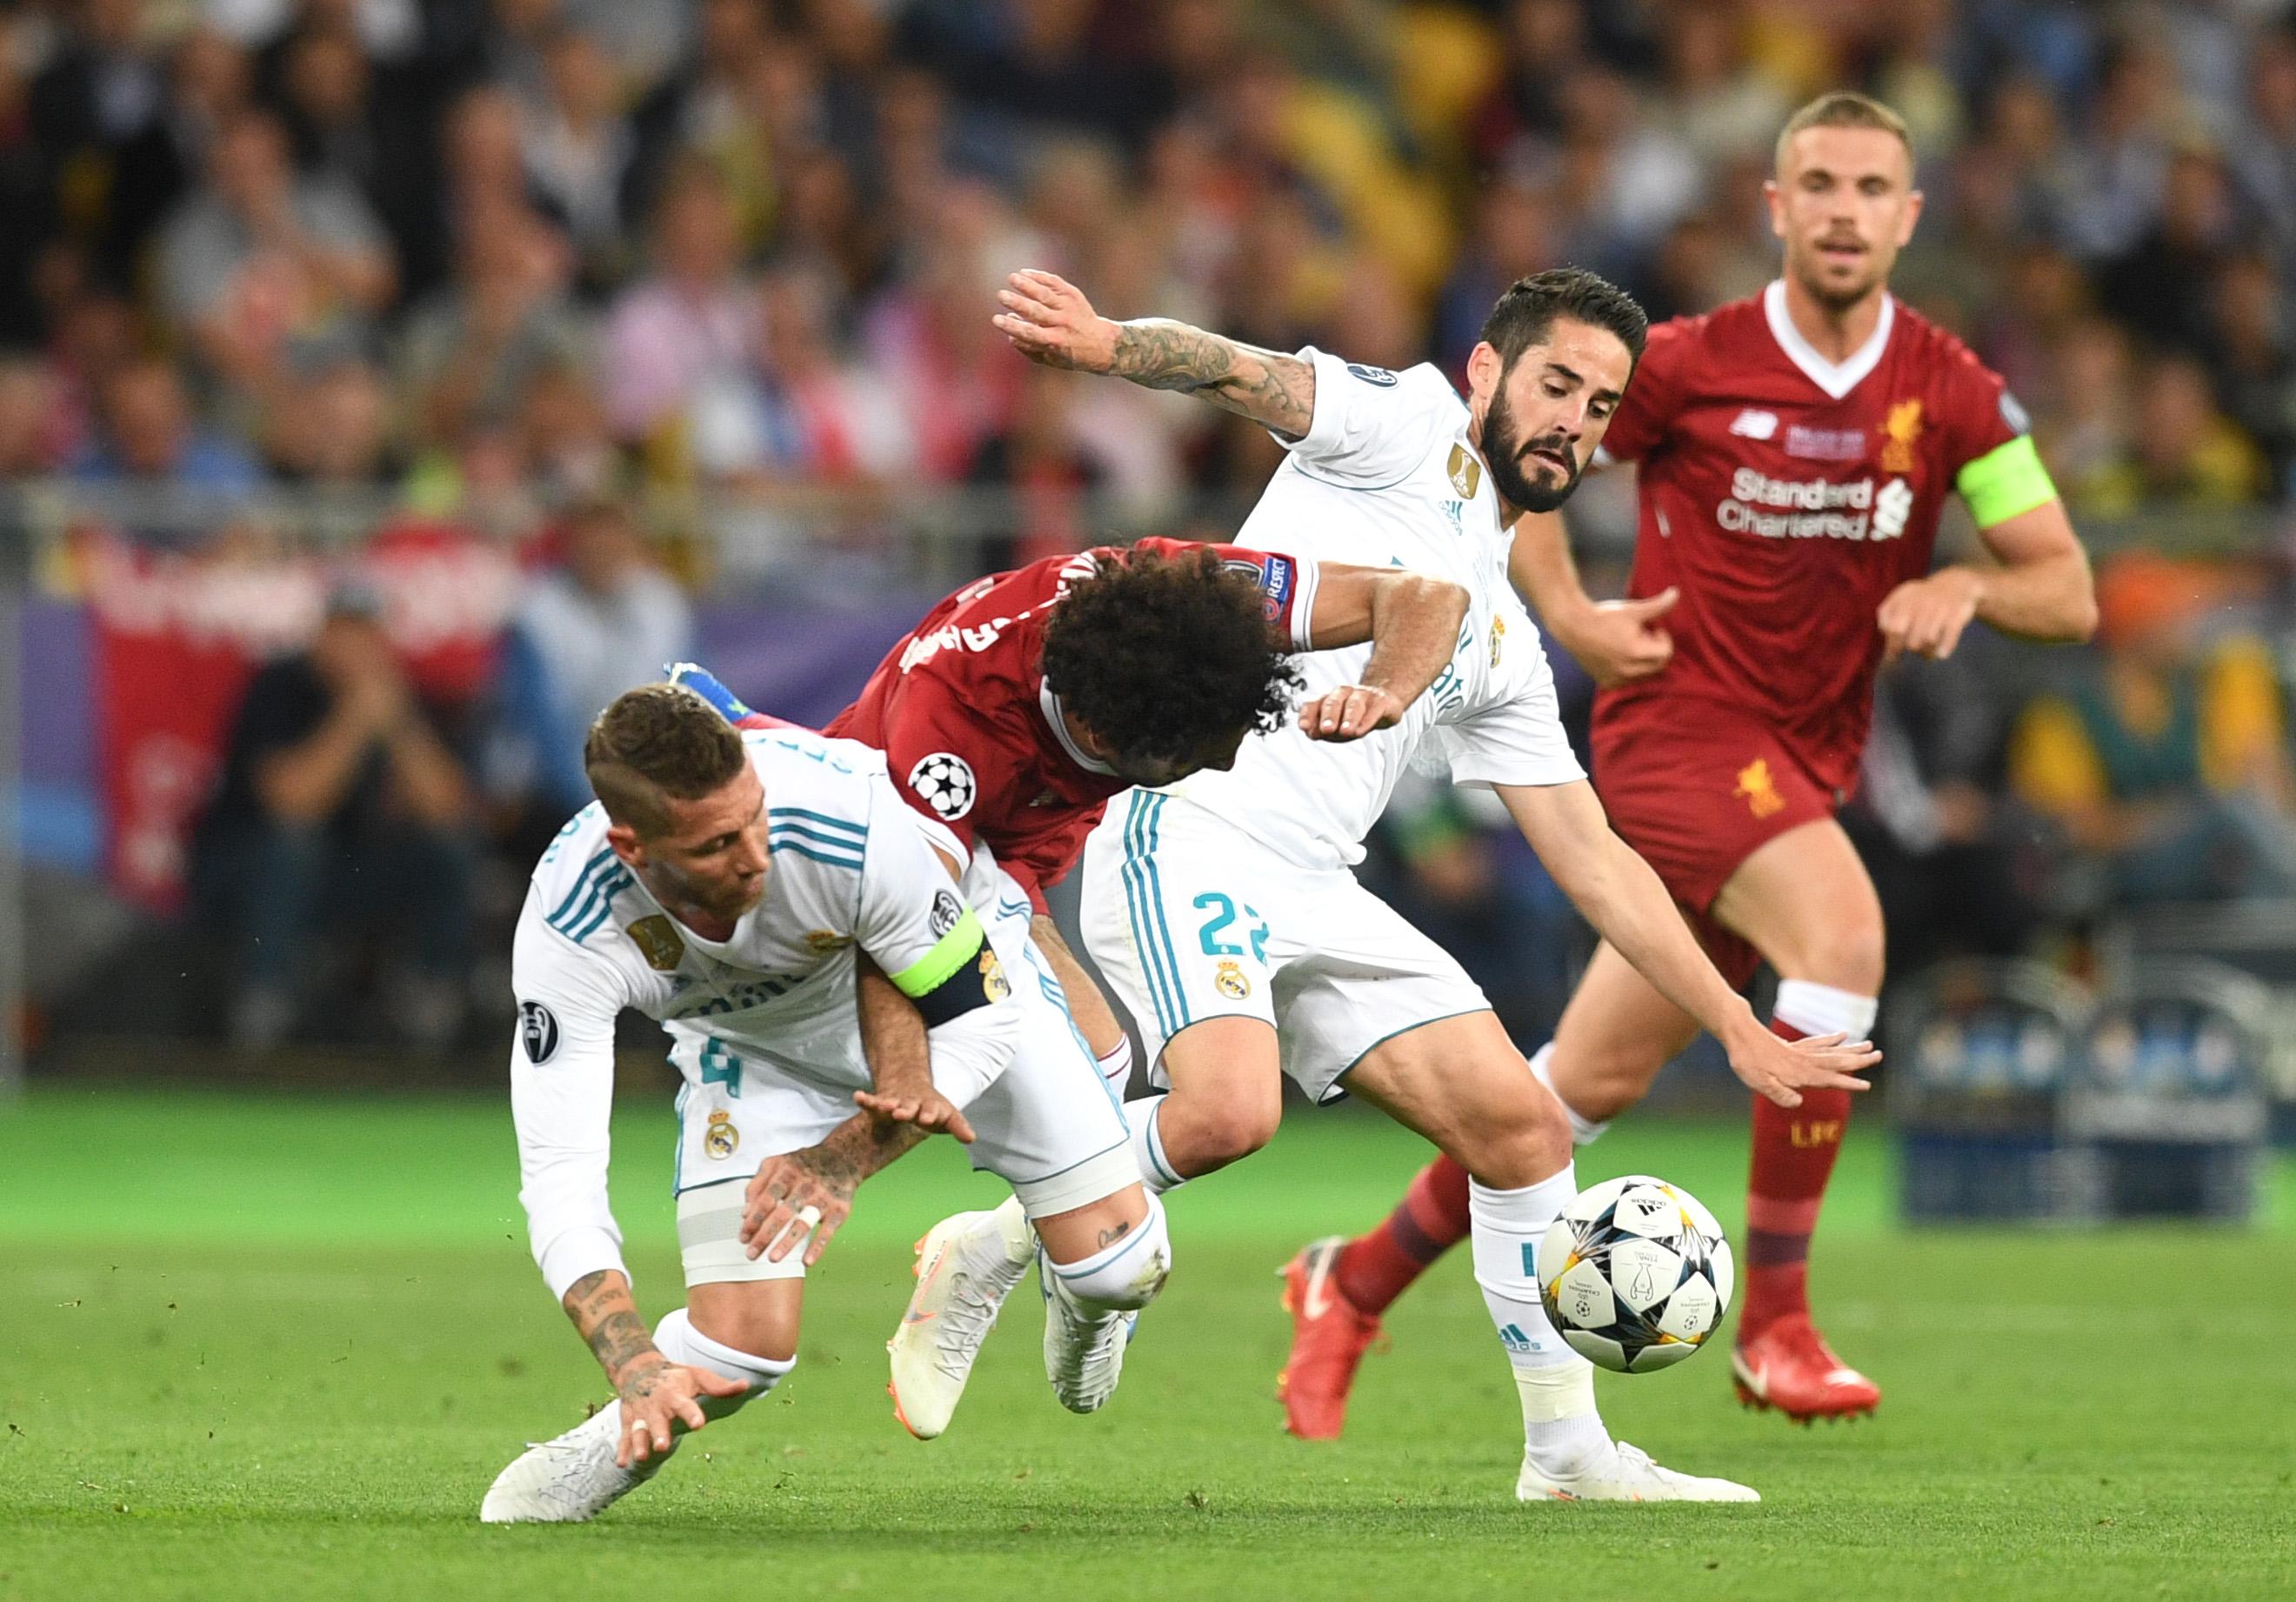 Sergio Ramos pins Mohamed Salah's arm in a take-down tackle, dislocating Salah's shoulder- Real Madrid v Liverpool - UEFA Champions League Final 2018